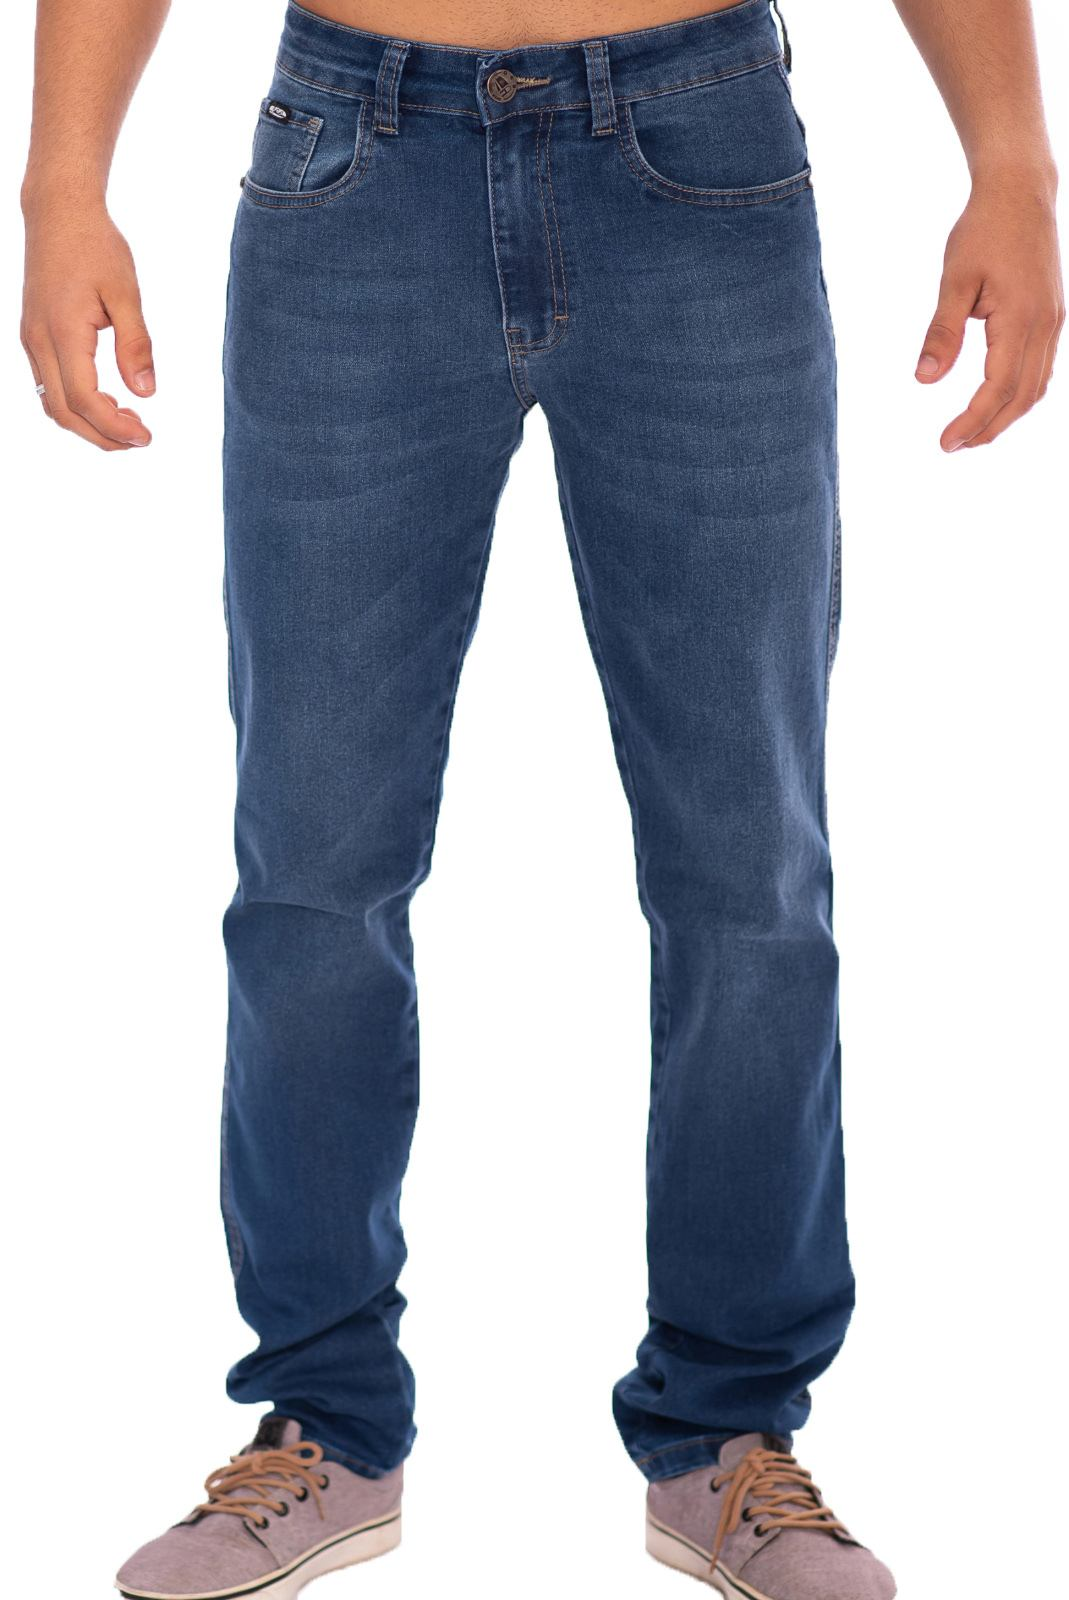 Calça Jeans Masculina Corte Reto Aee Surf